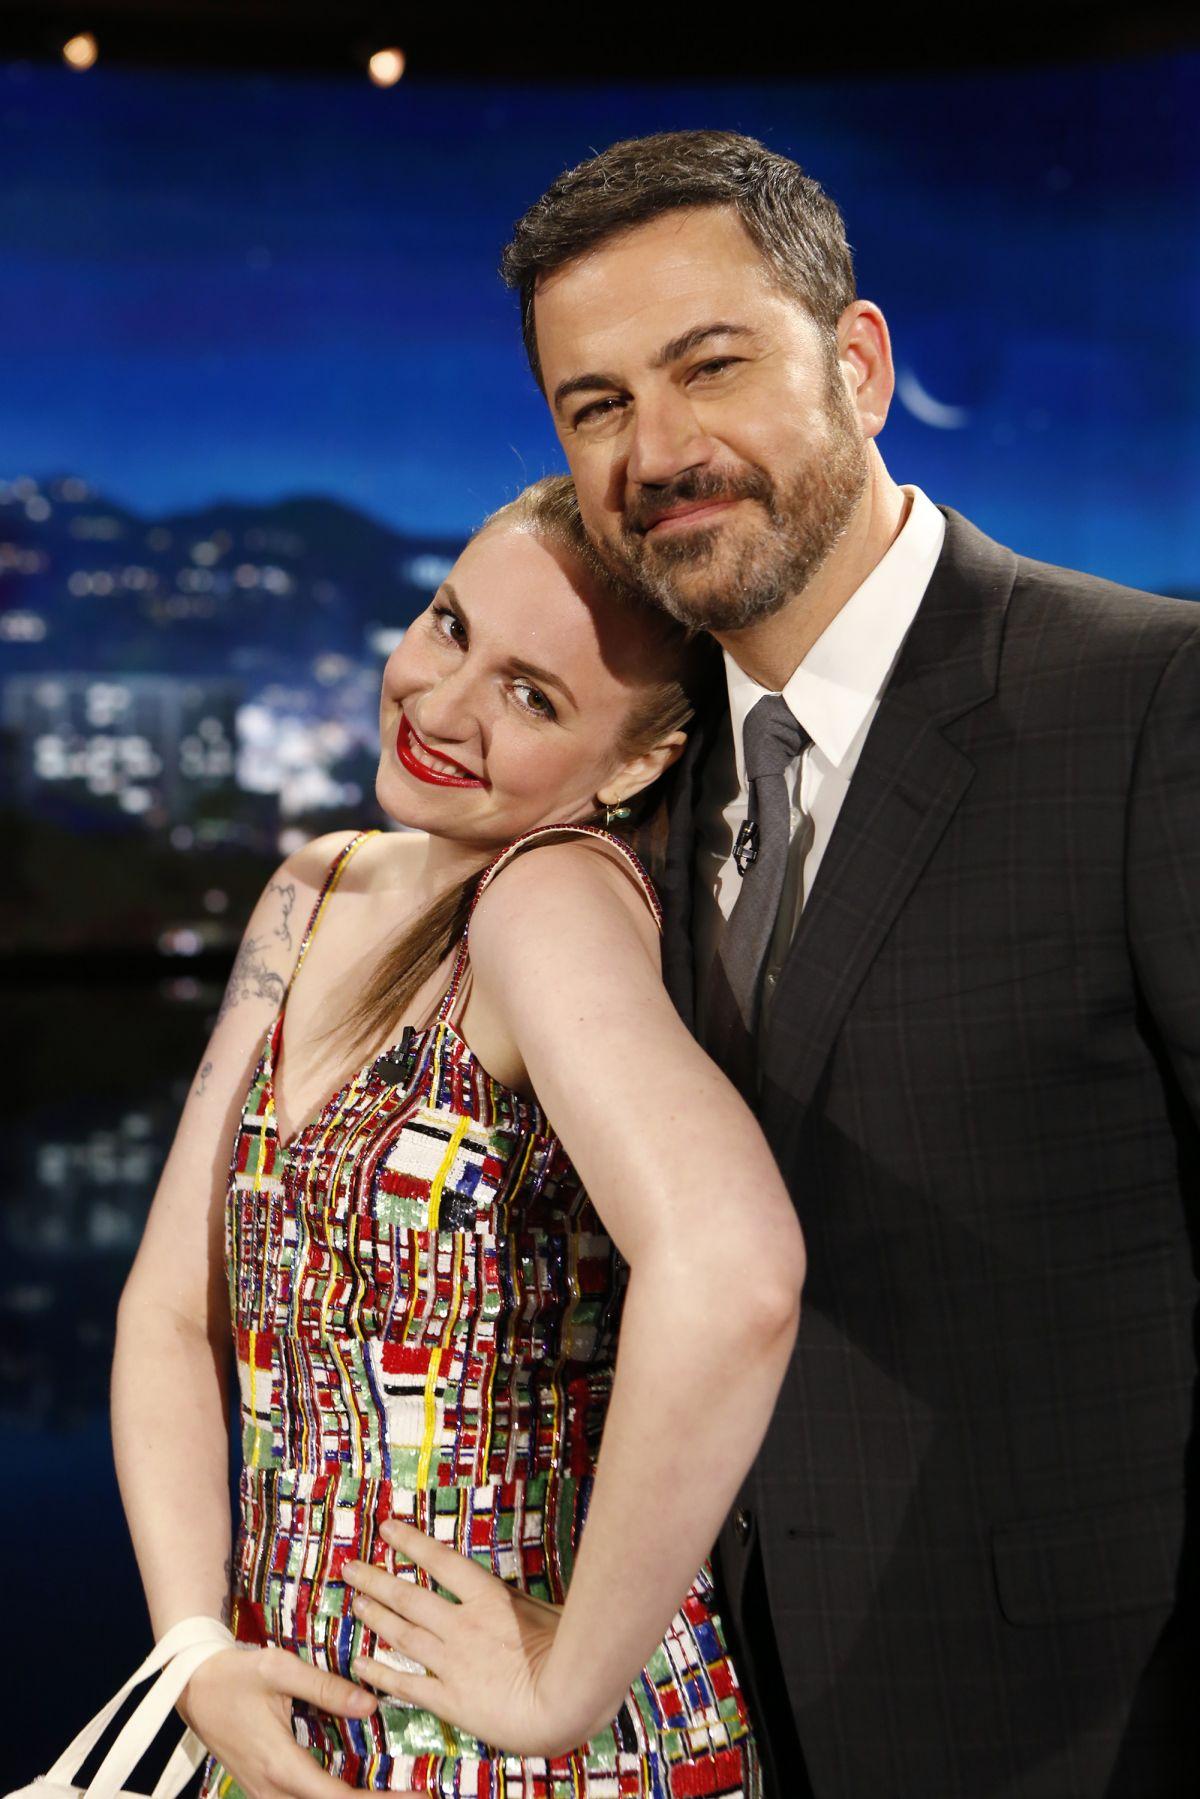 LENA DUNHAM at Jimmy Kimmel Live 04/05/2017